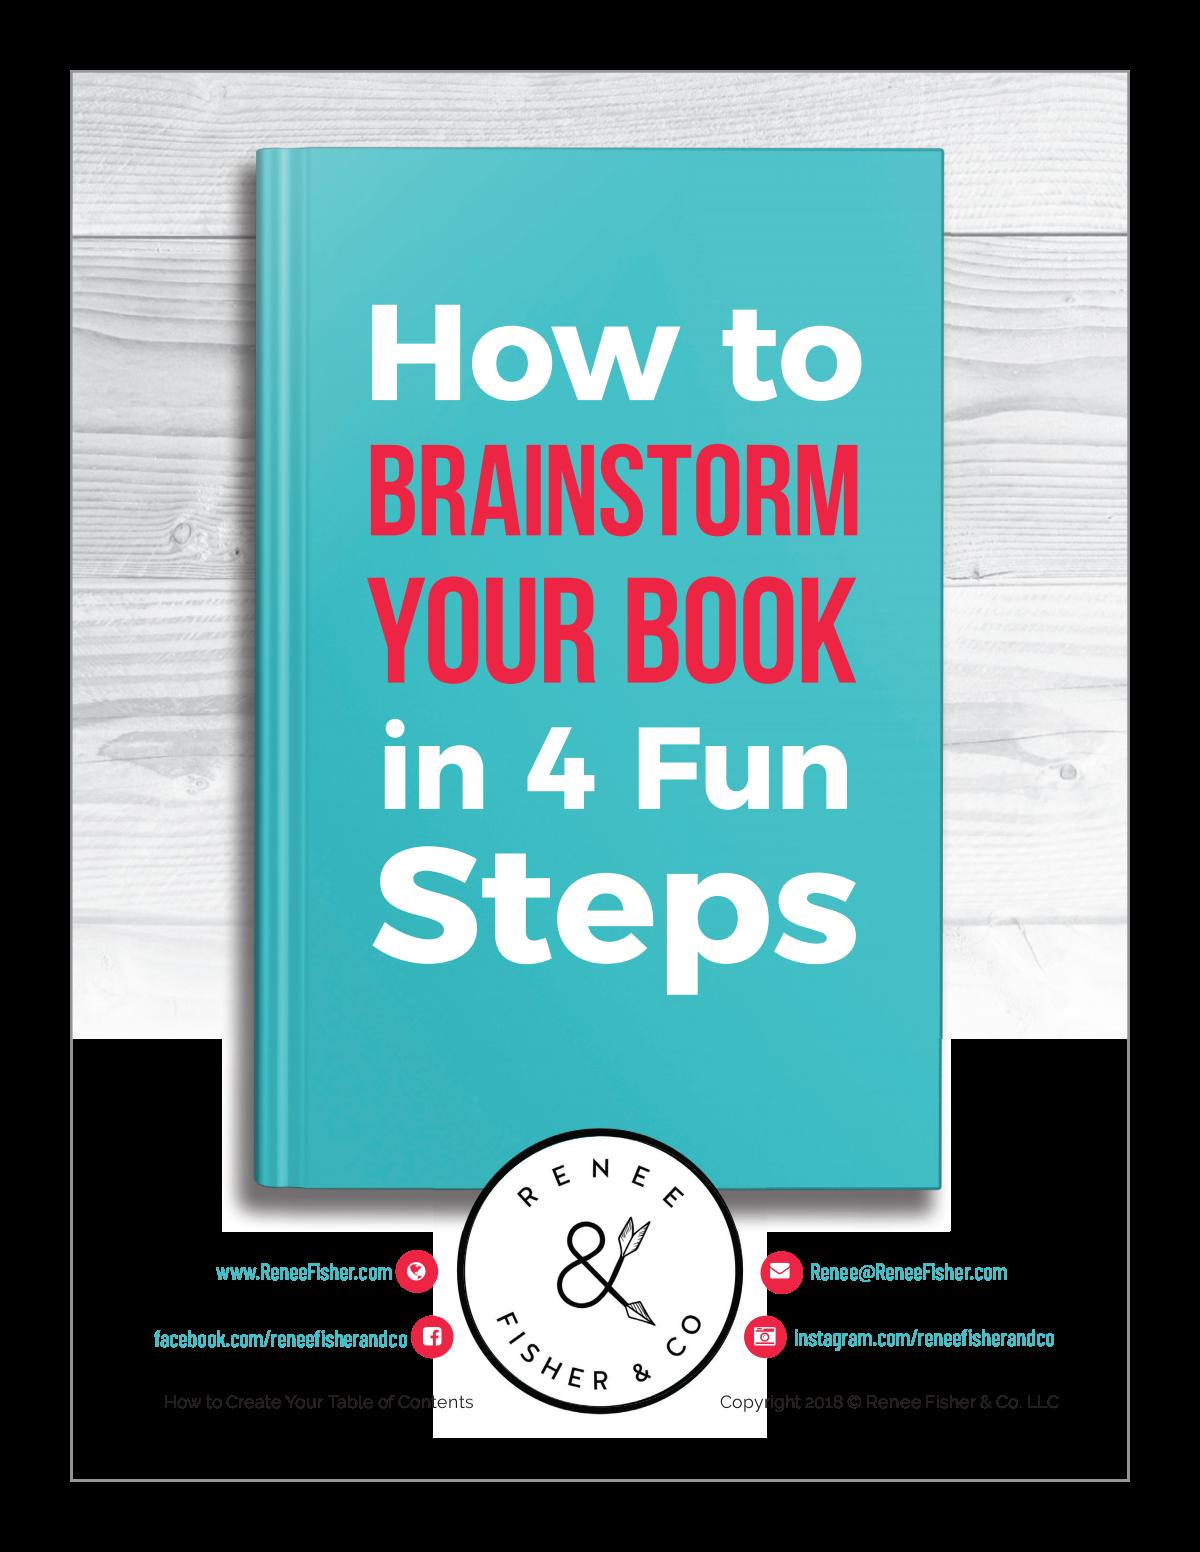 Book Brainstorm Lead Magnet